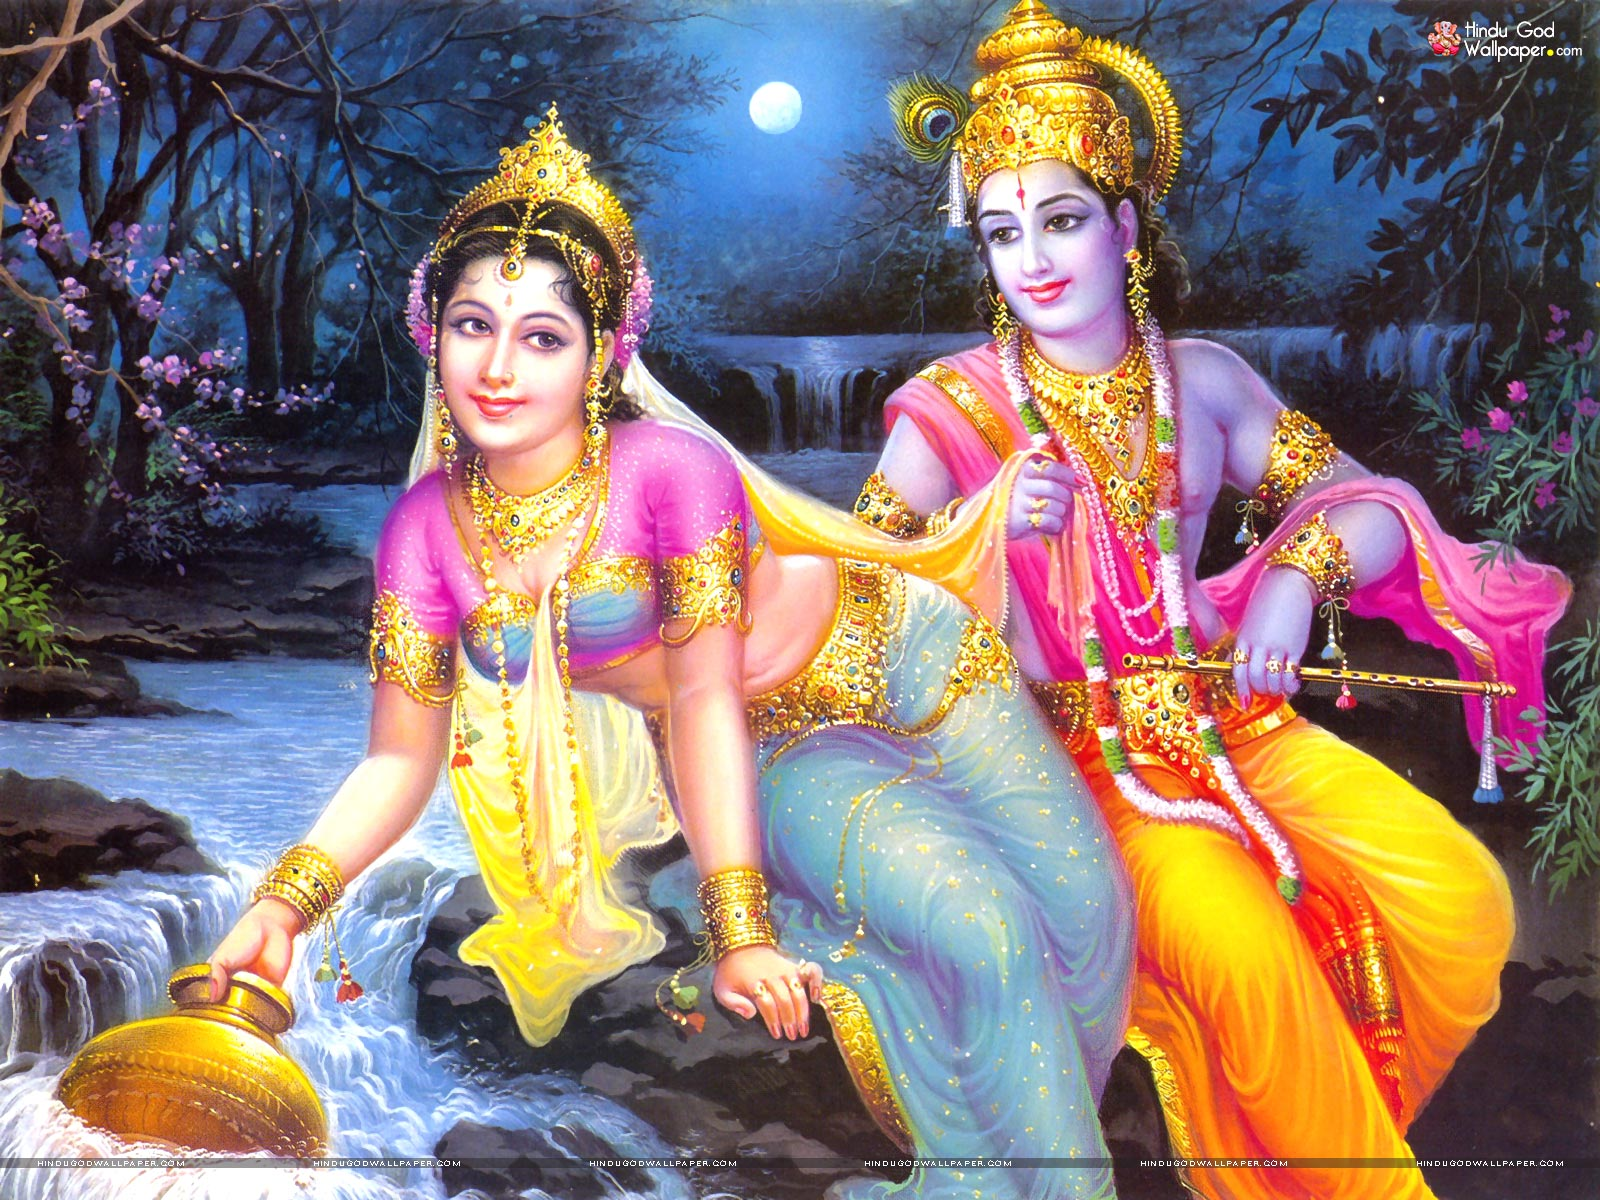 gods radha krishna wallpaper